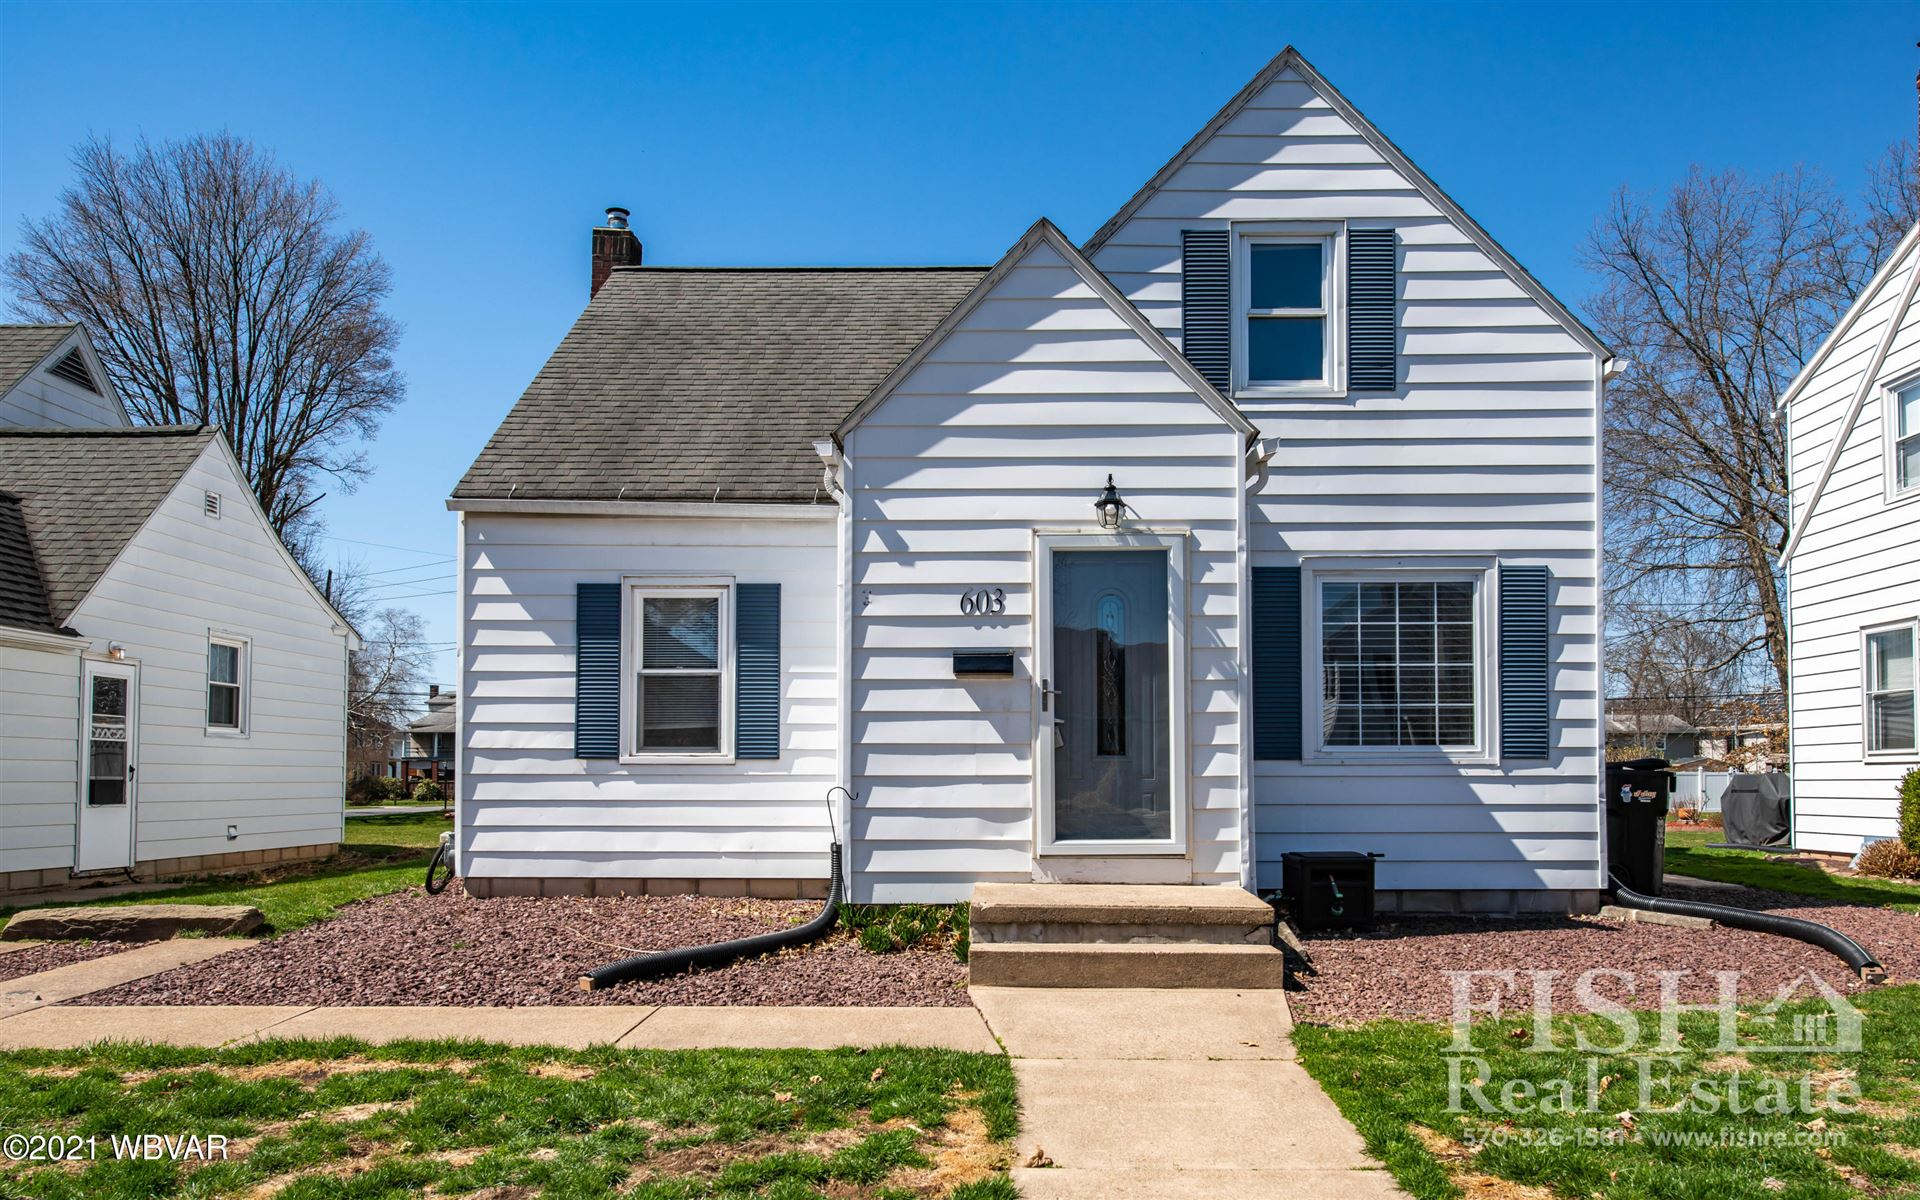 603 N ARCH STREET, Montoursville, PA 17754 - #: WB-92197